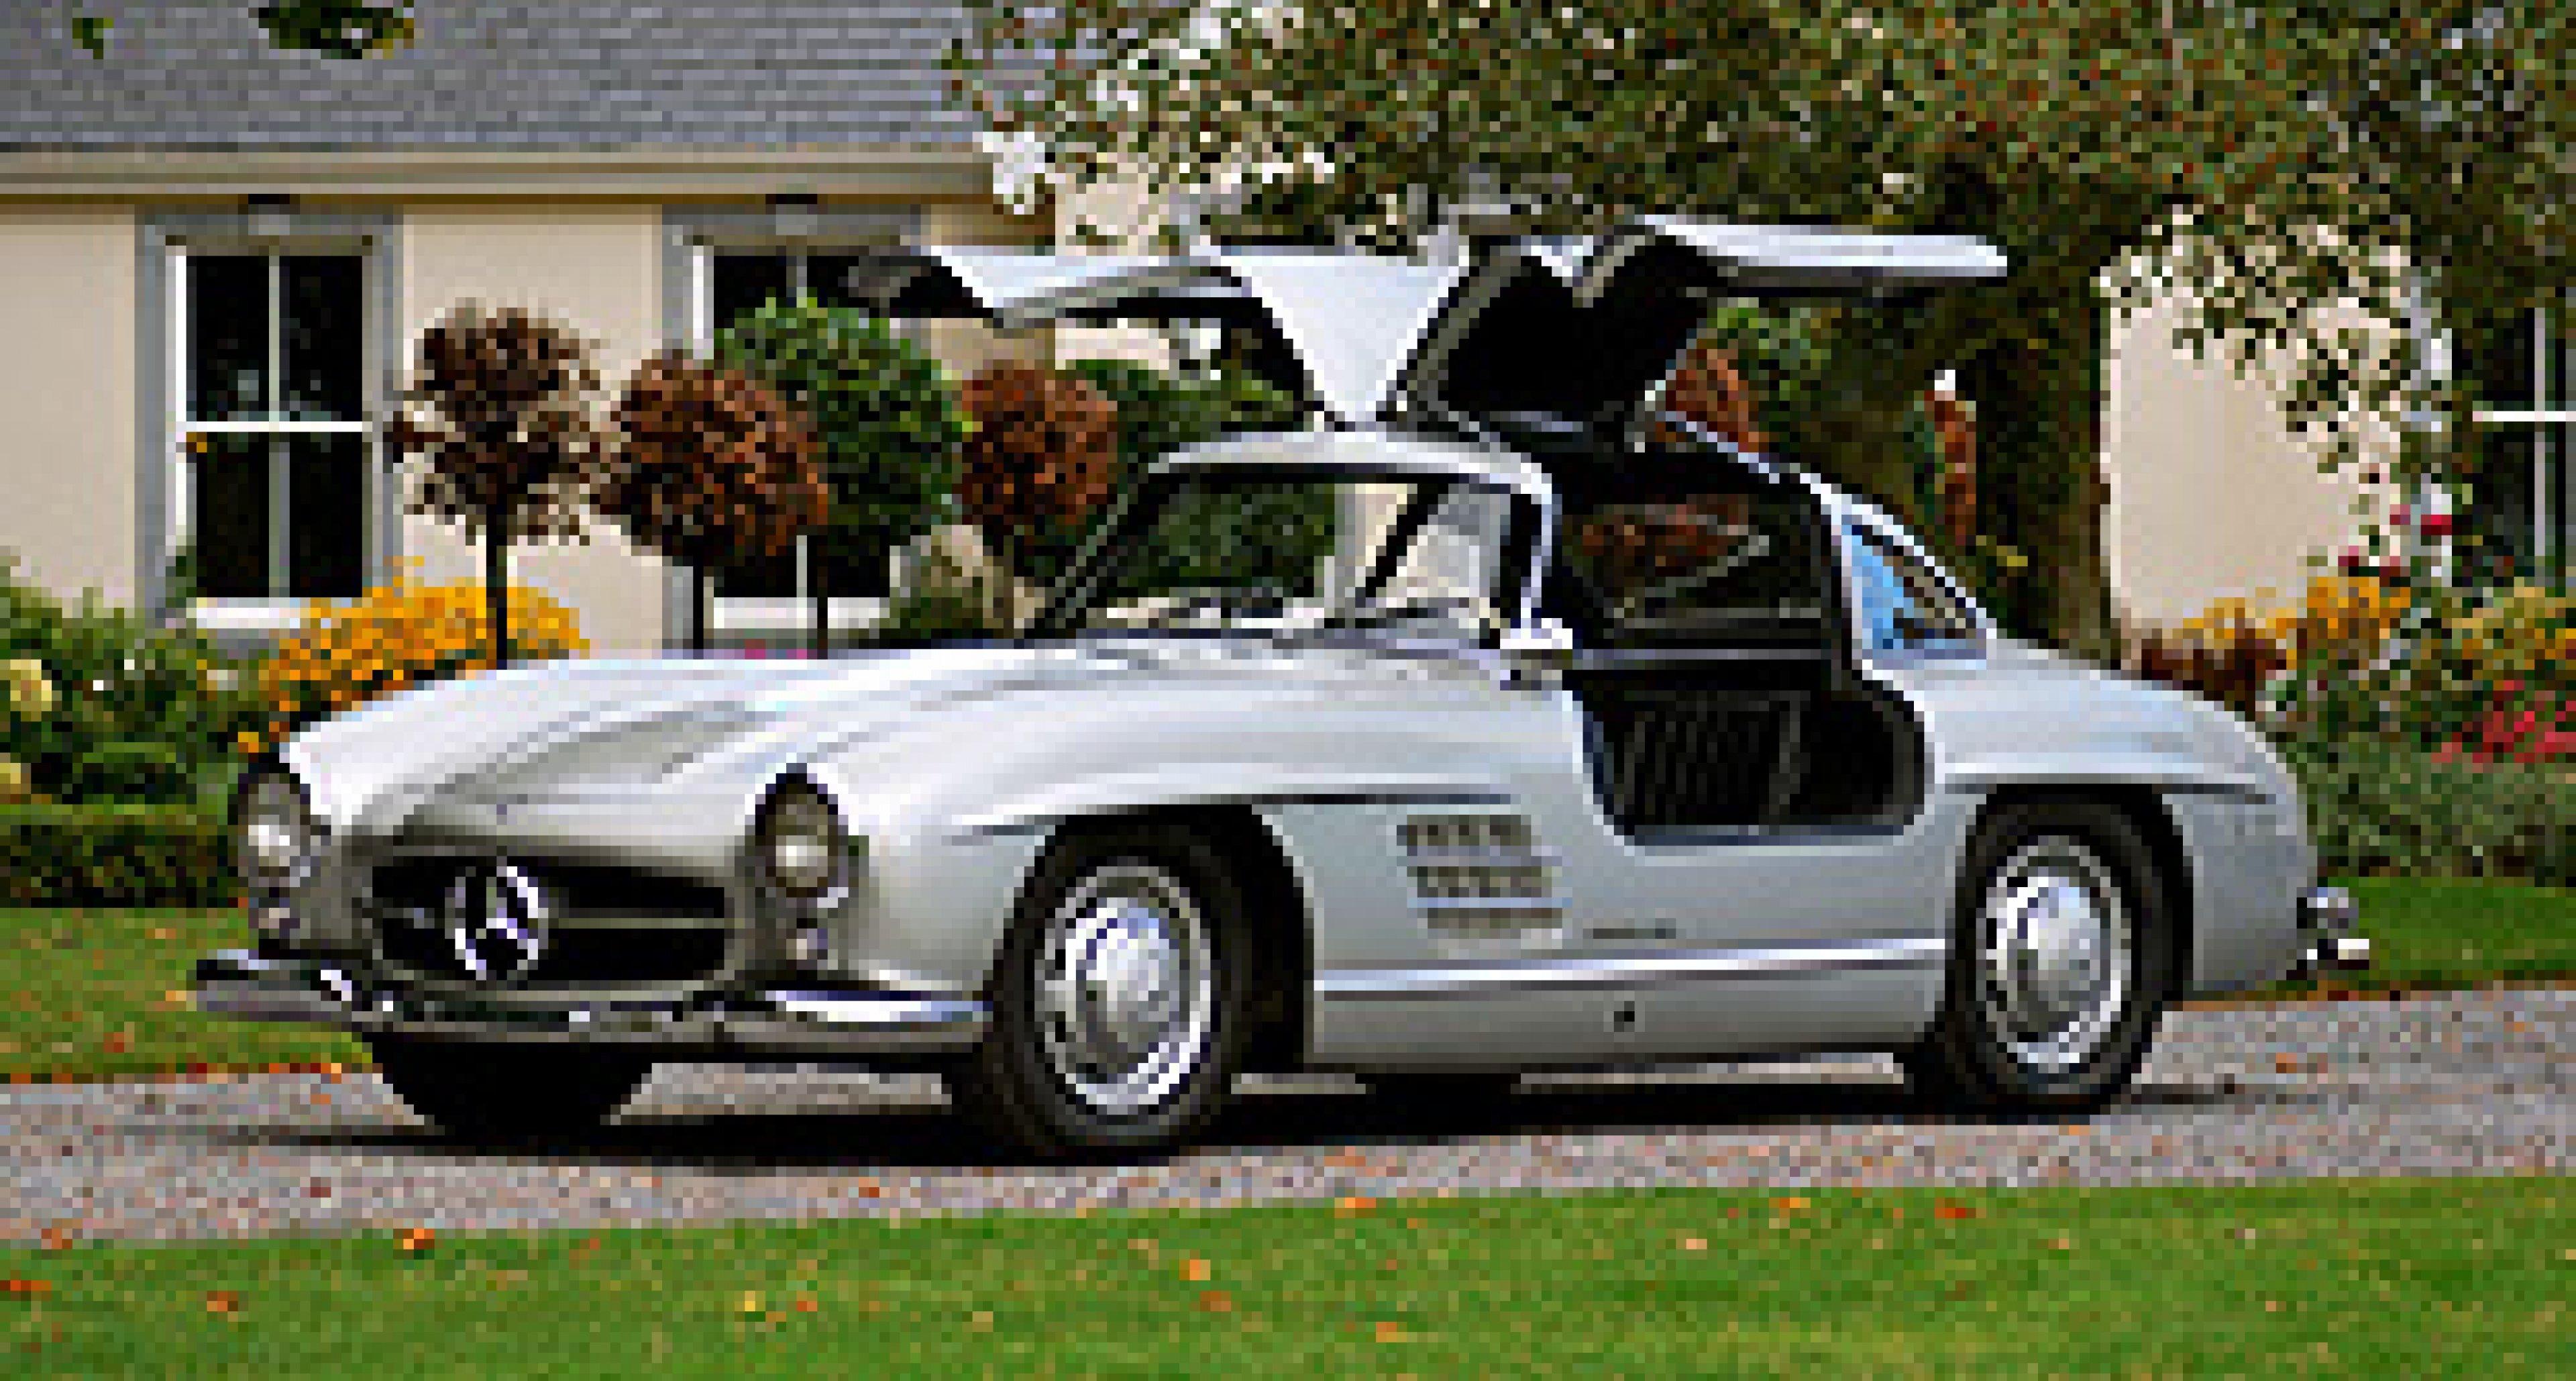 Mercedes-Benz Flügeltürer erzielt Höchstpreis bei Bonhams-Auktion